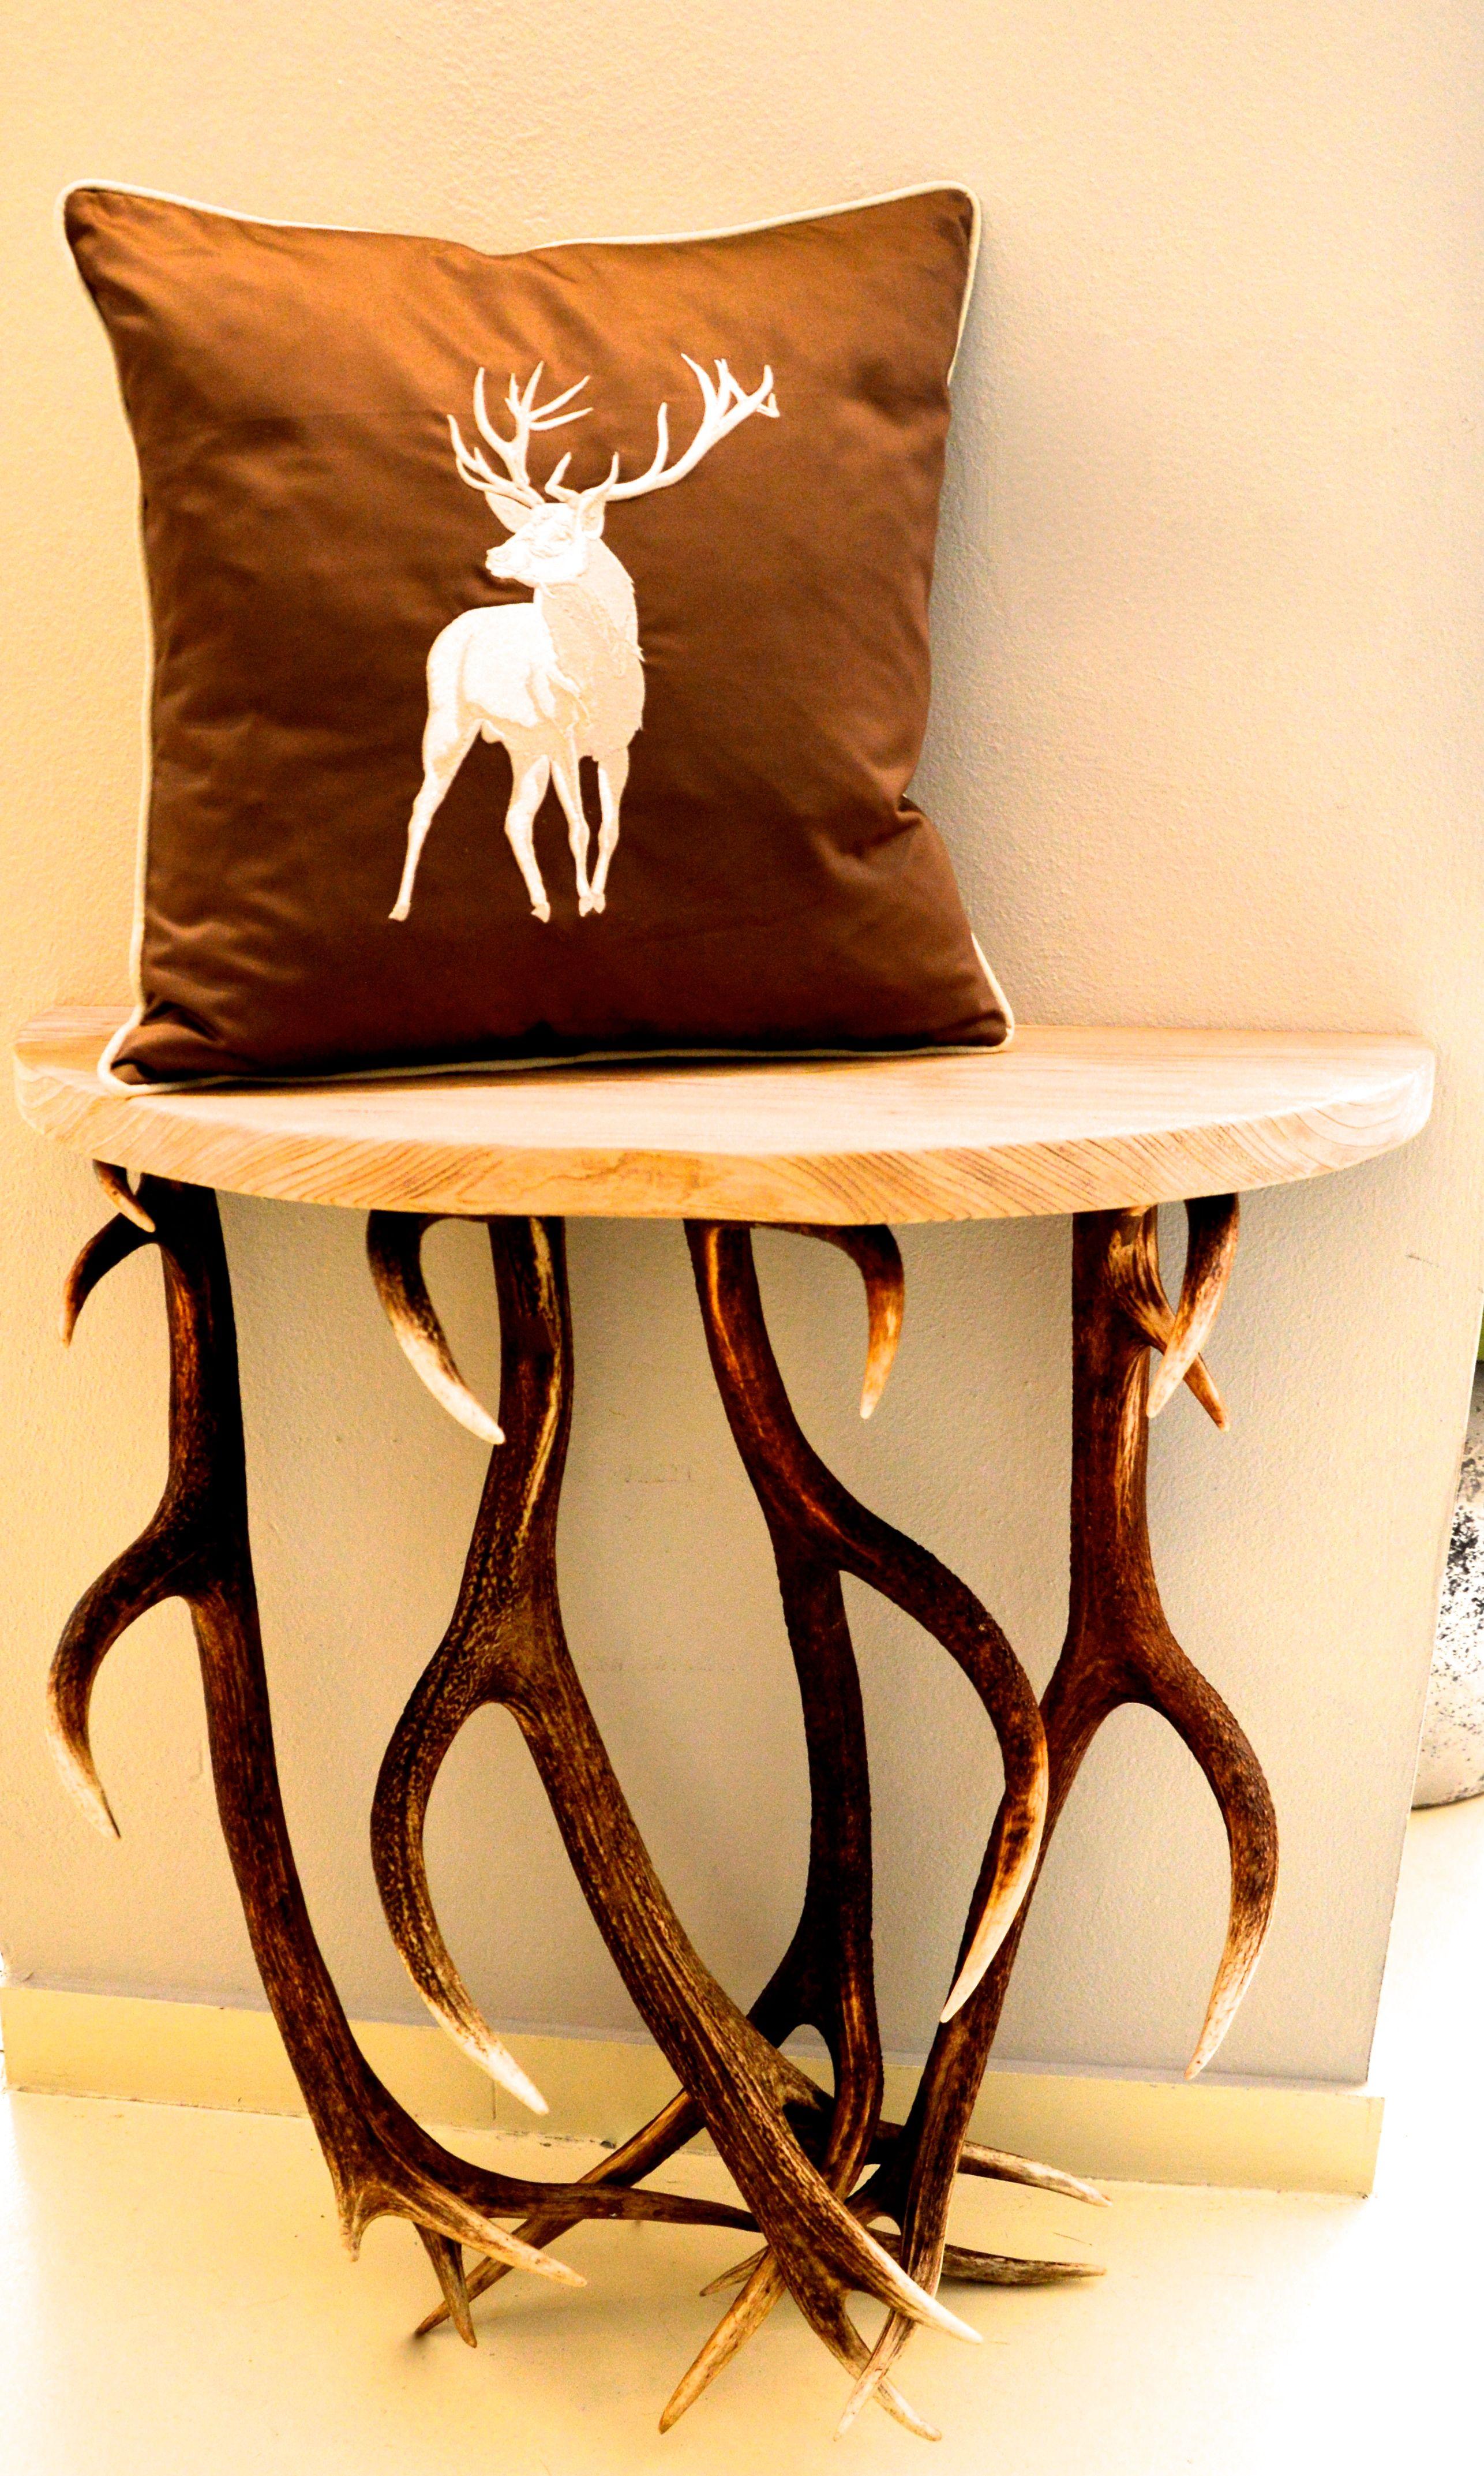 Le Fineza Meran Merano Home Interior Chalet Design Deko ...